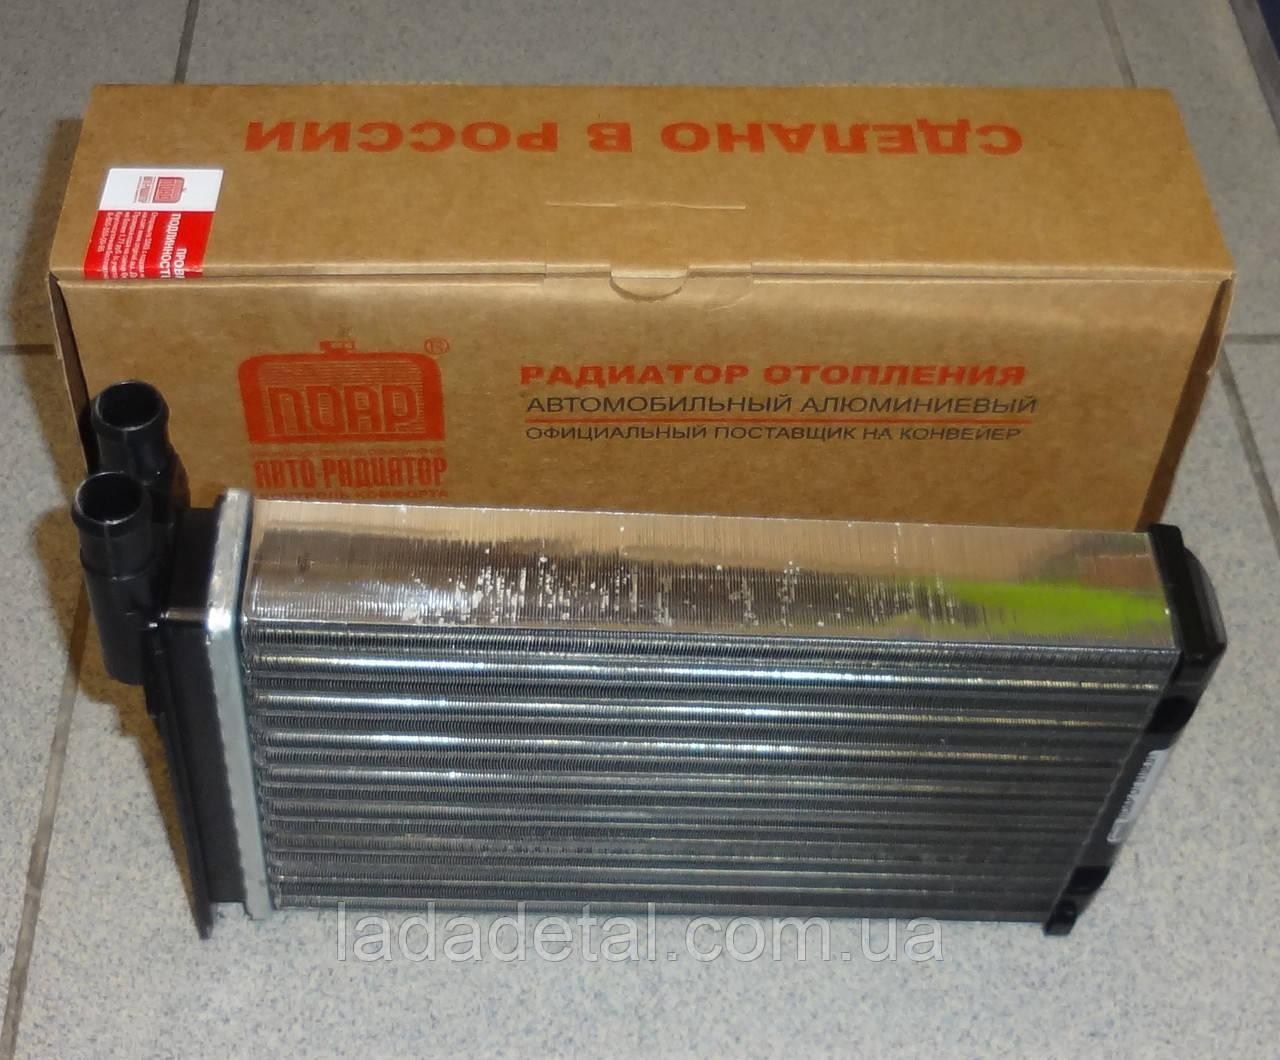 Печка (радиатор печки) ВАЗ 2108, 2109, 21099, 2115 ПОАР